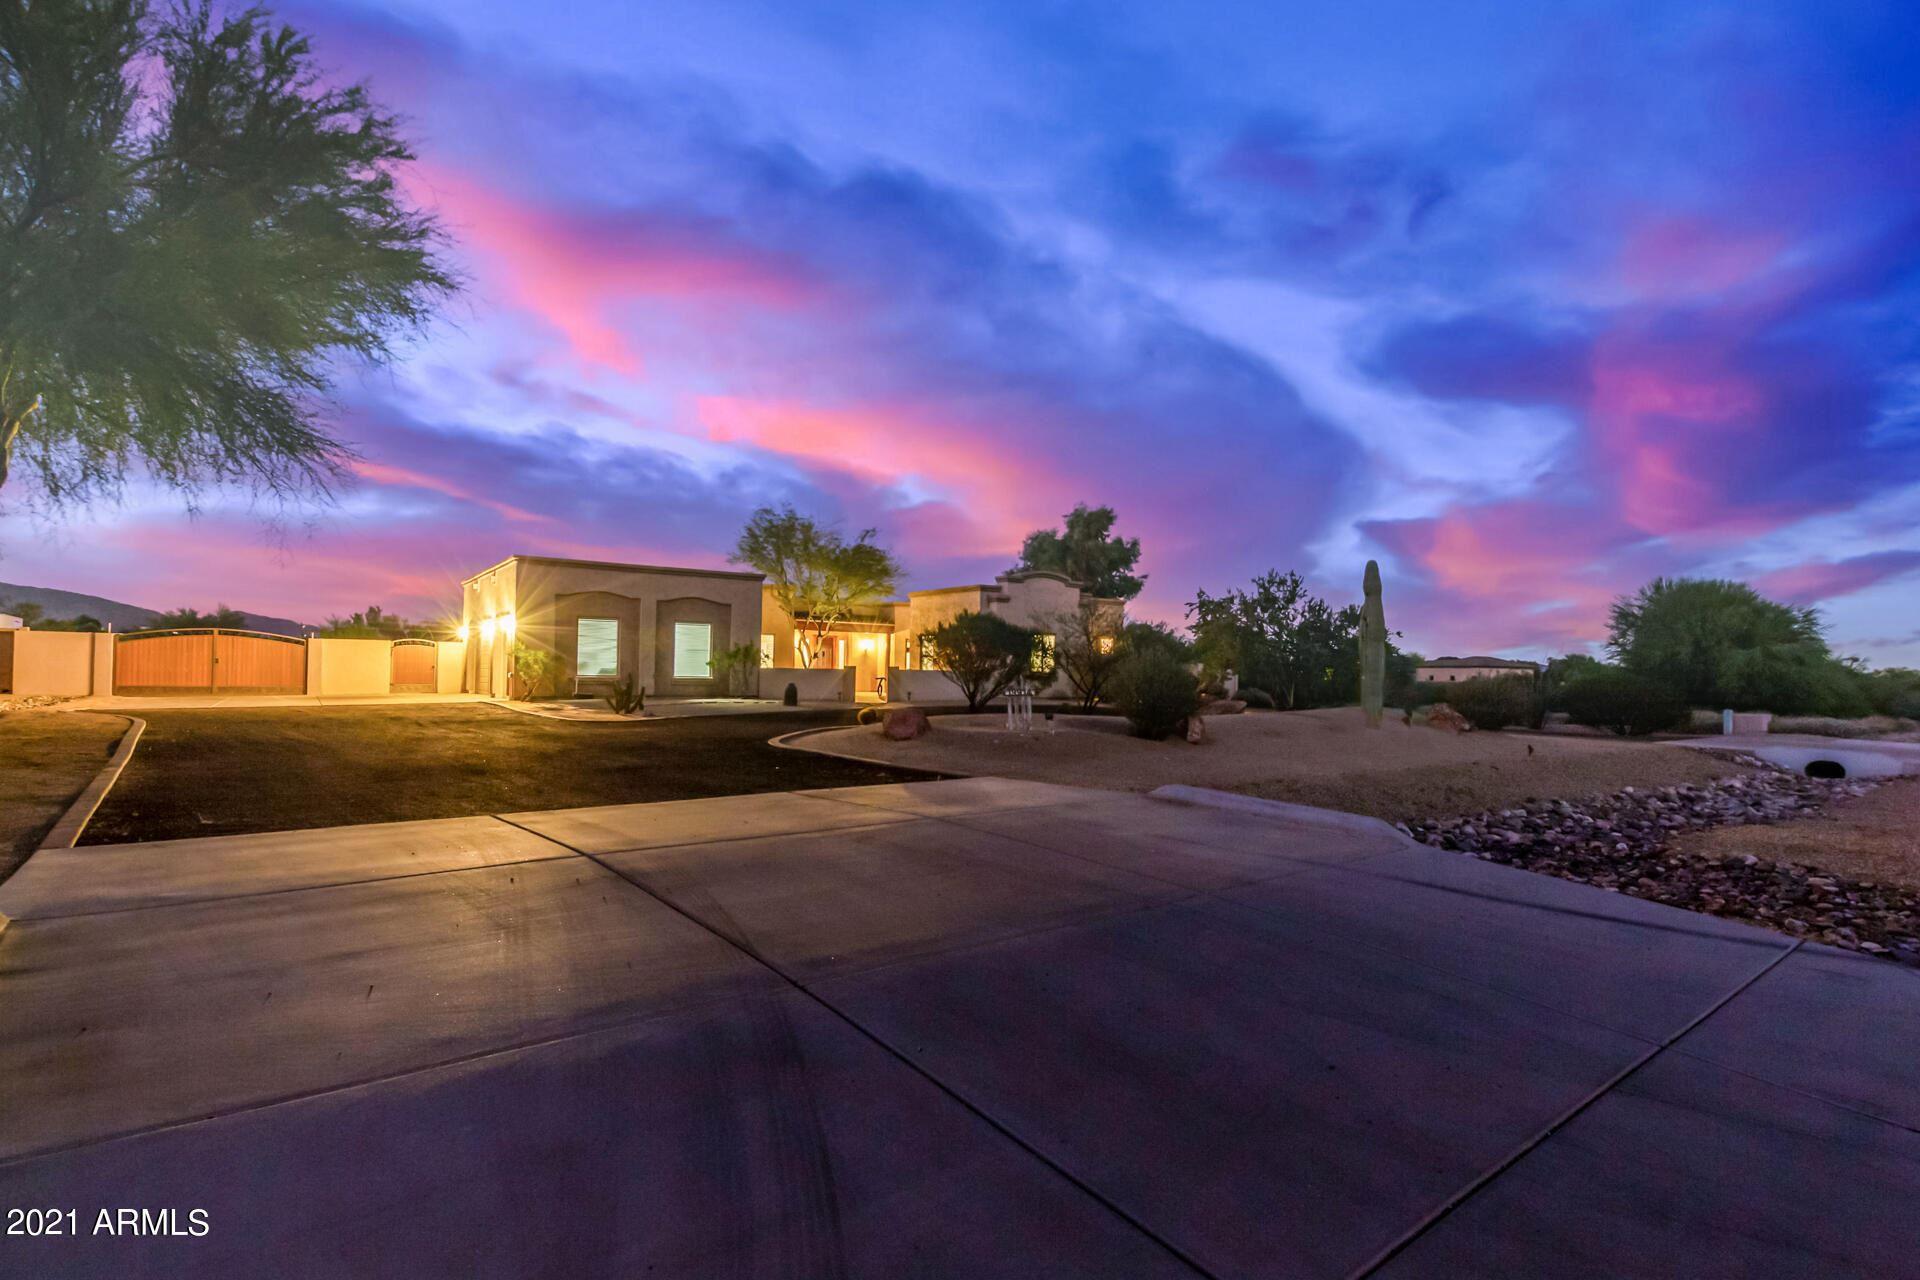 Photo of 19914 W WHITTON Avenue, Buckeye, AZ 85396 (MLS # 6307544)